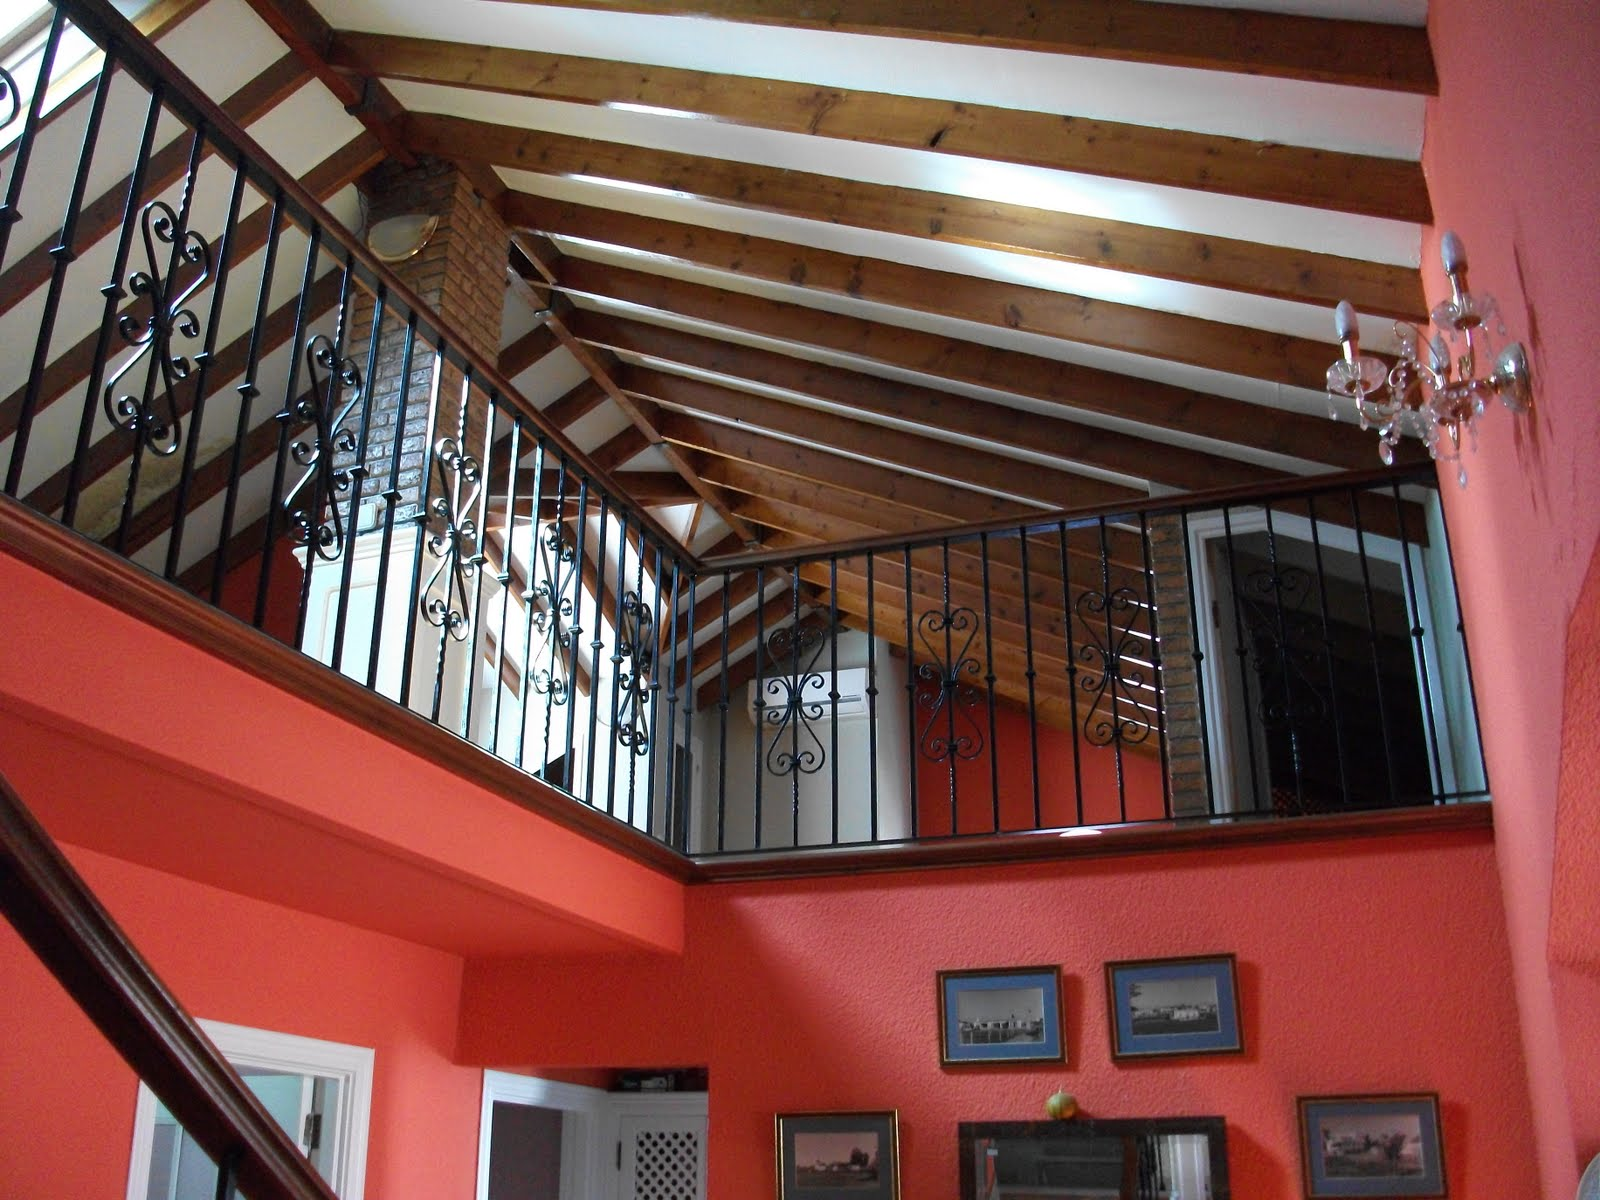 Pintar trabajos con pintura exterior e interior de - Como reformar tu casa ...